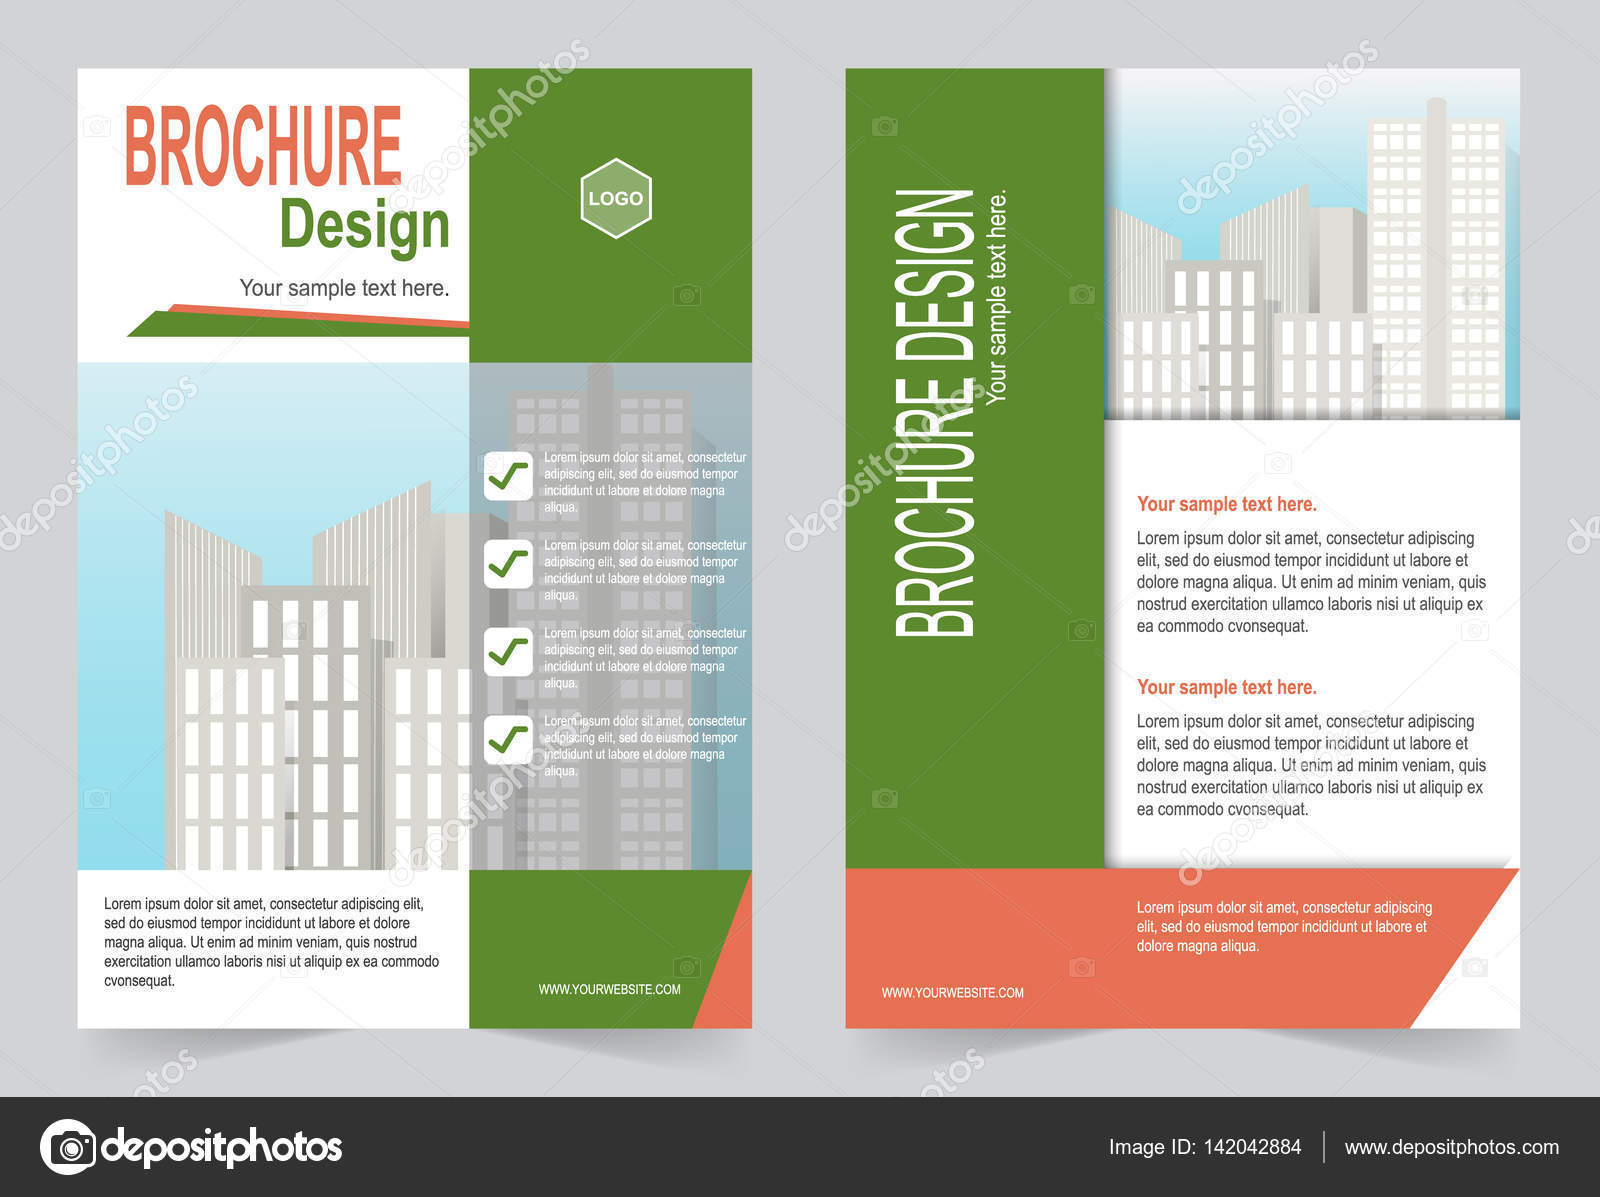 Broschüre Vorlage, Flyer Design grün — Stockvektor © keath369 #142042884